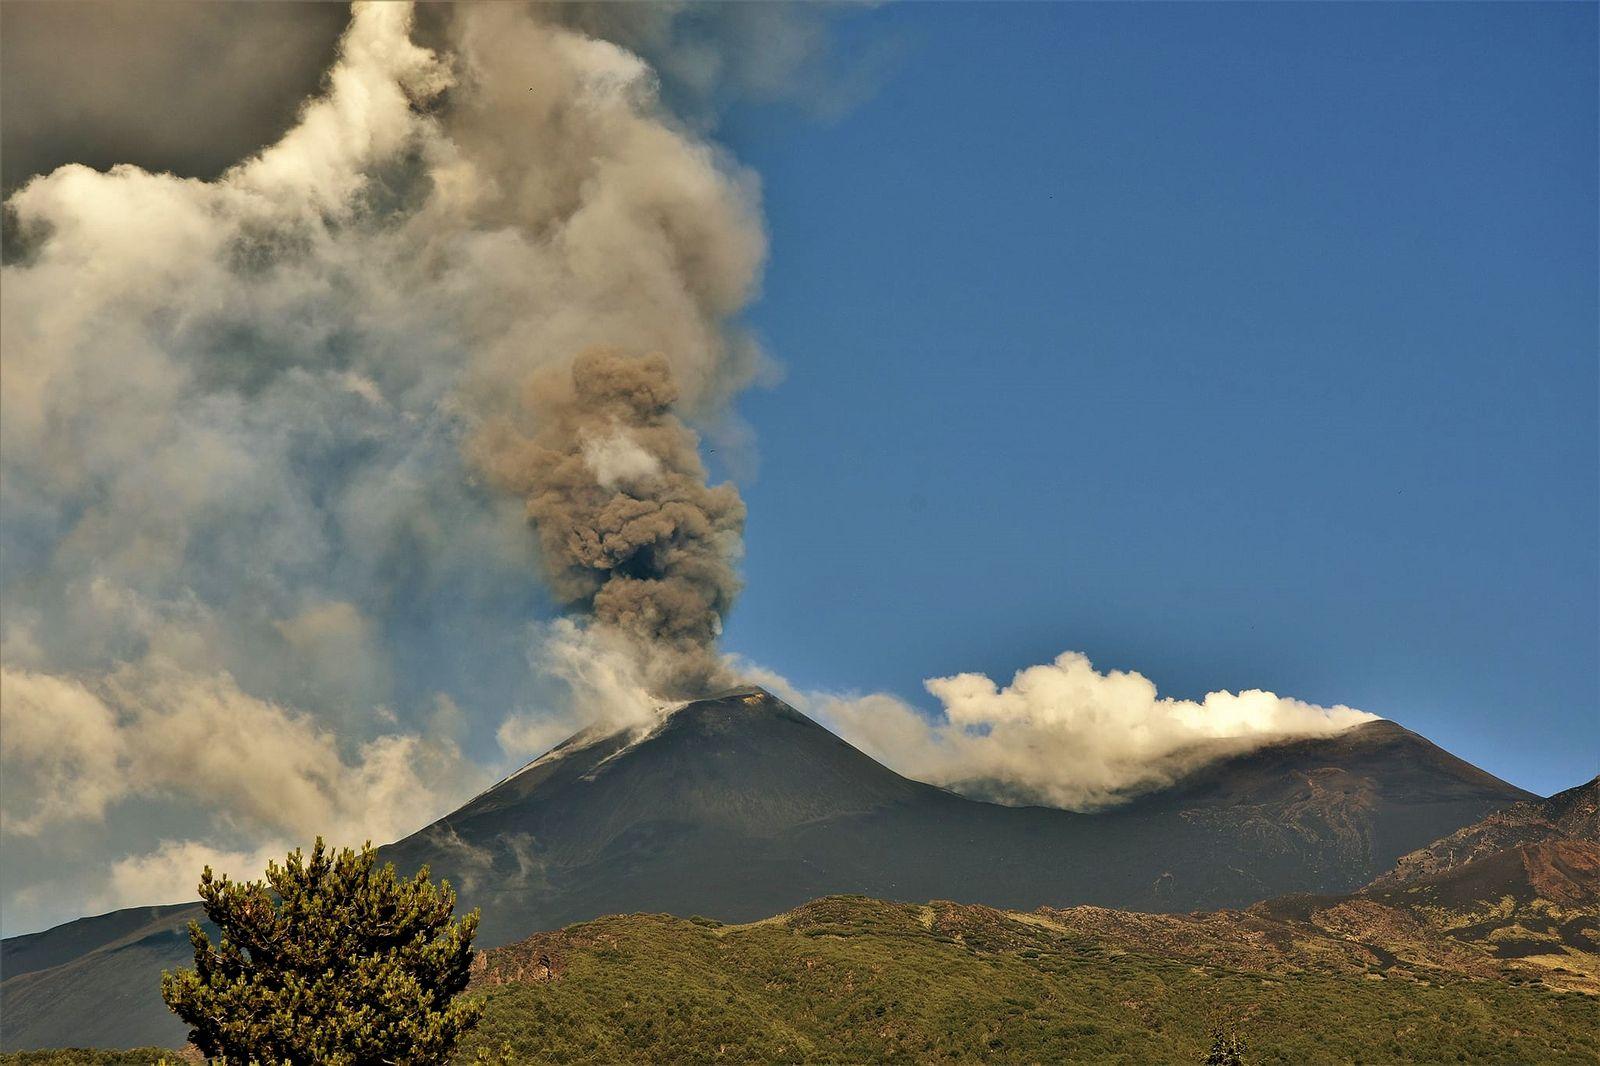 Etna - 20.07.2021 - avec l'aimable autorisation de © Pippo Scarpinati